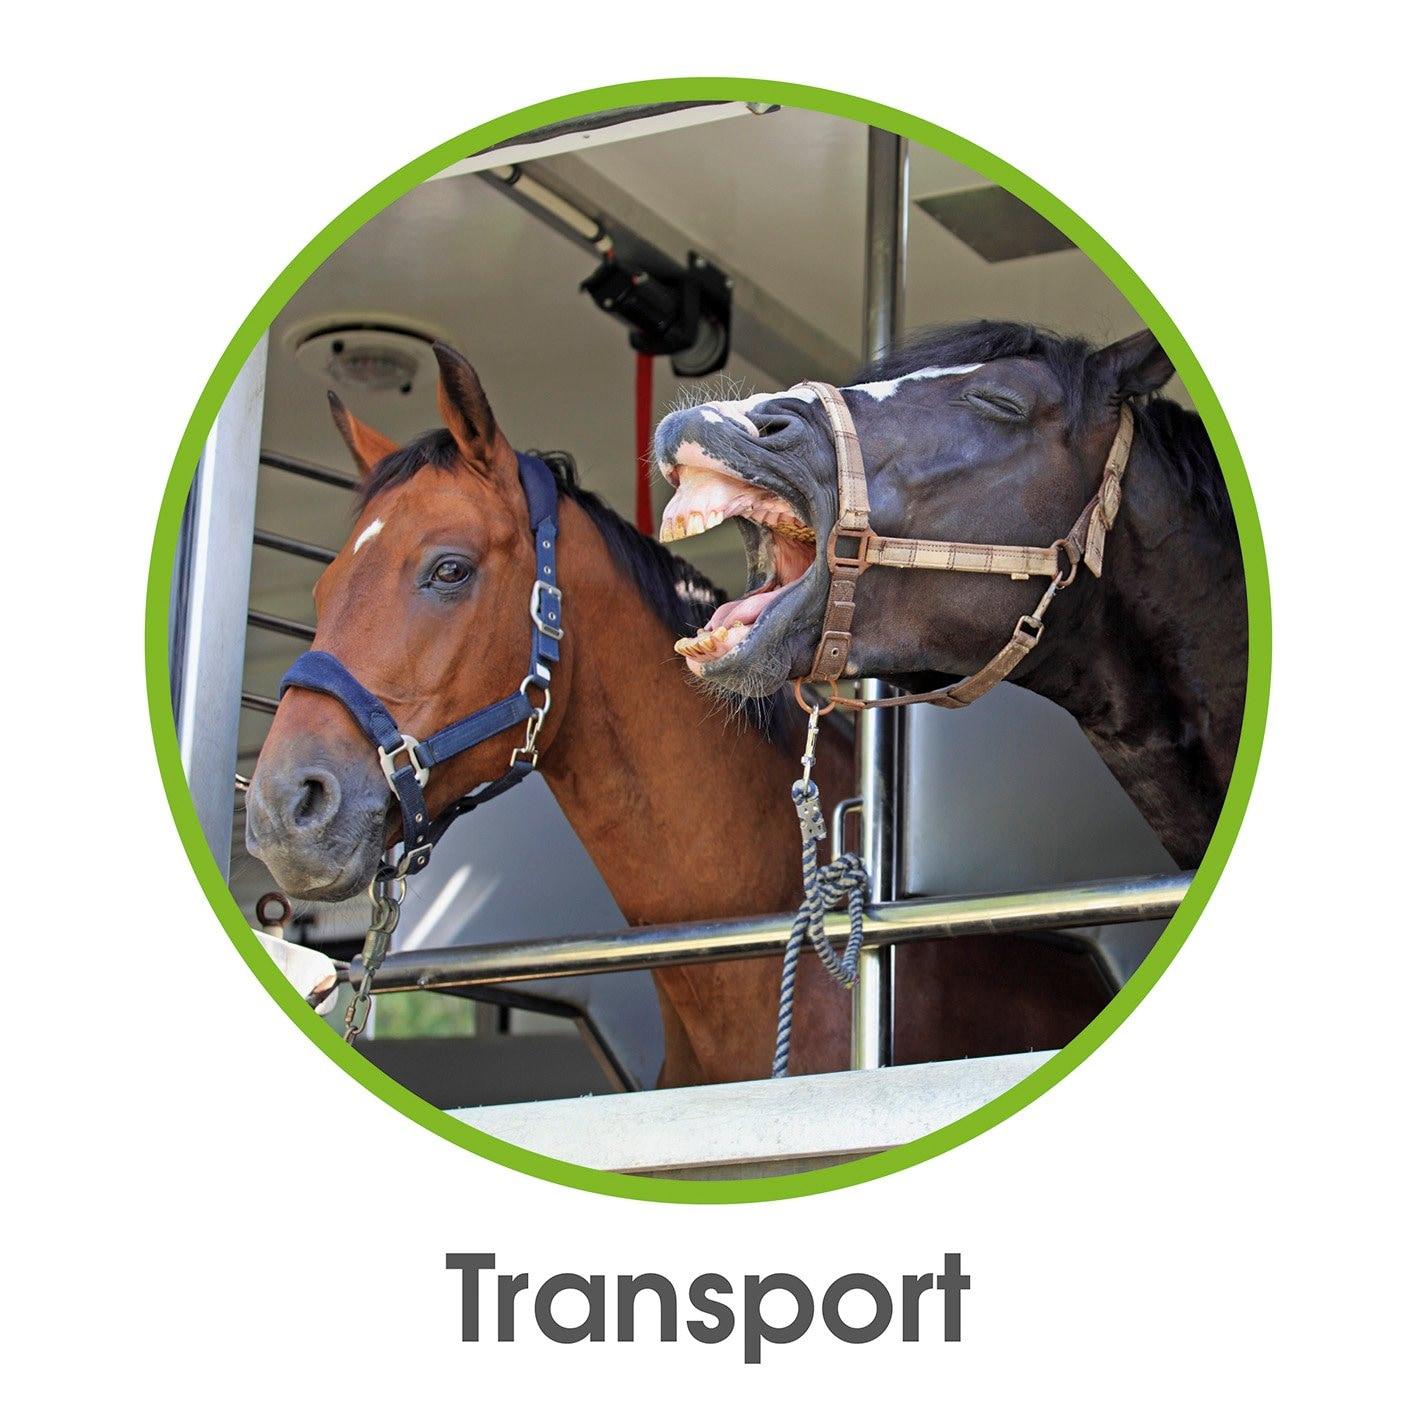 Relaxopet Entspannungsgerät Pferd 5V silber/grün